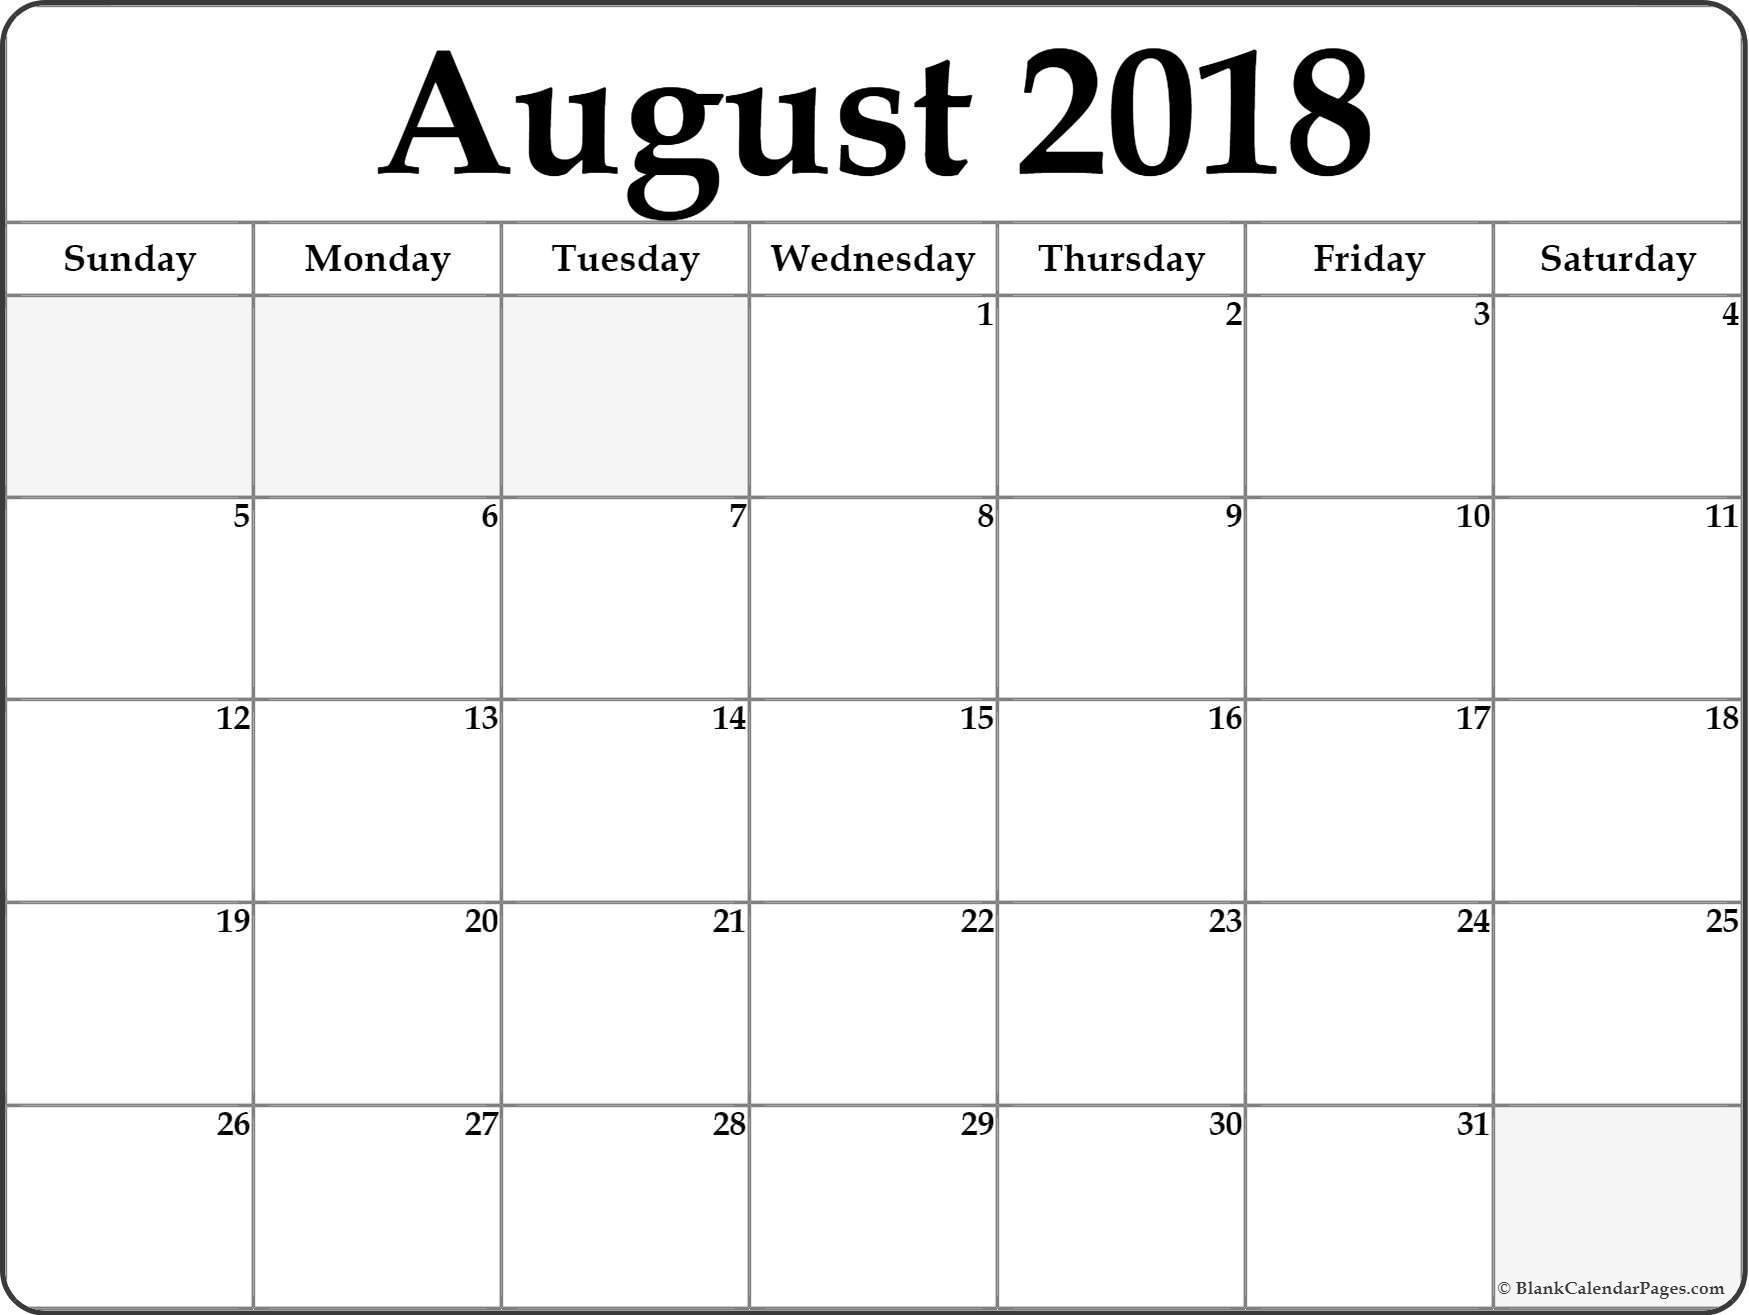 August 2018 Free Printable Blank Calendar Collection Free Full Page Printable August 2018 Calendar